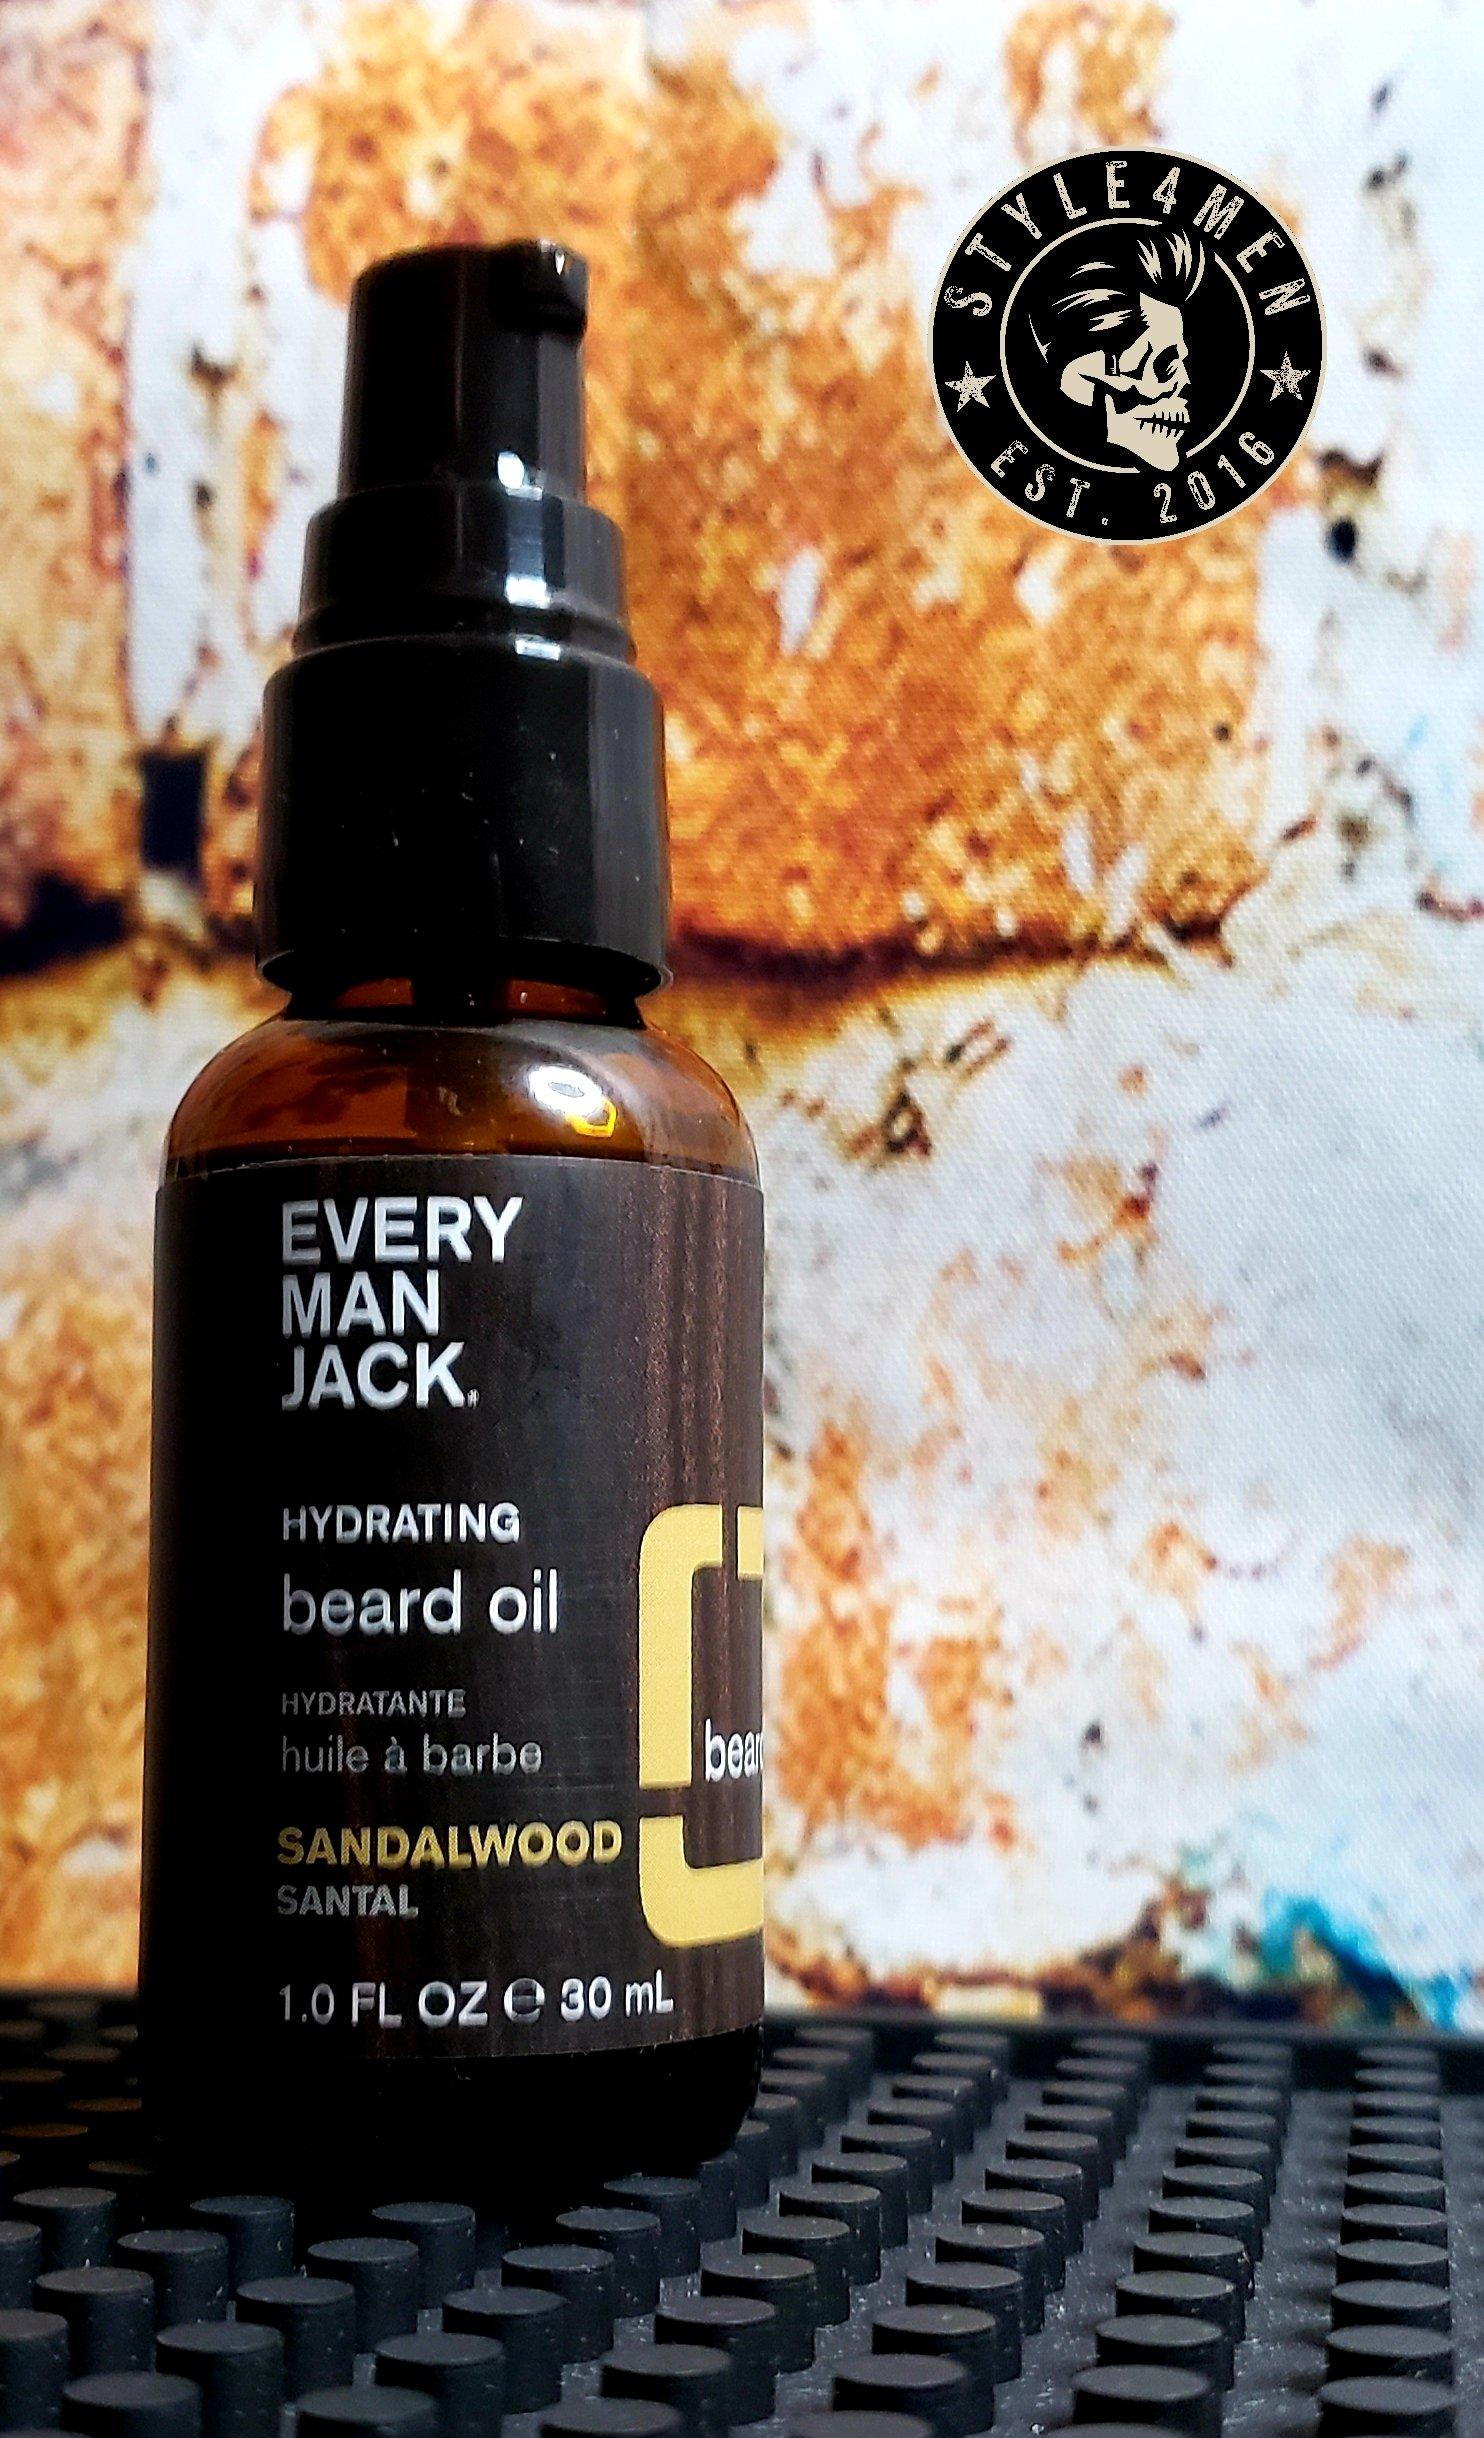 Every Man Jack's Sandalwood Beard Oil – Yum!